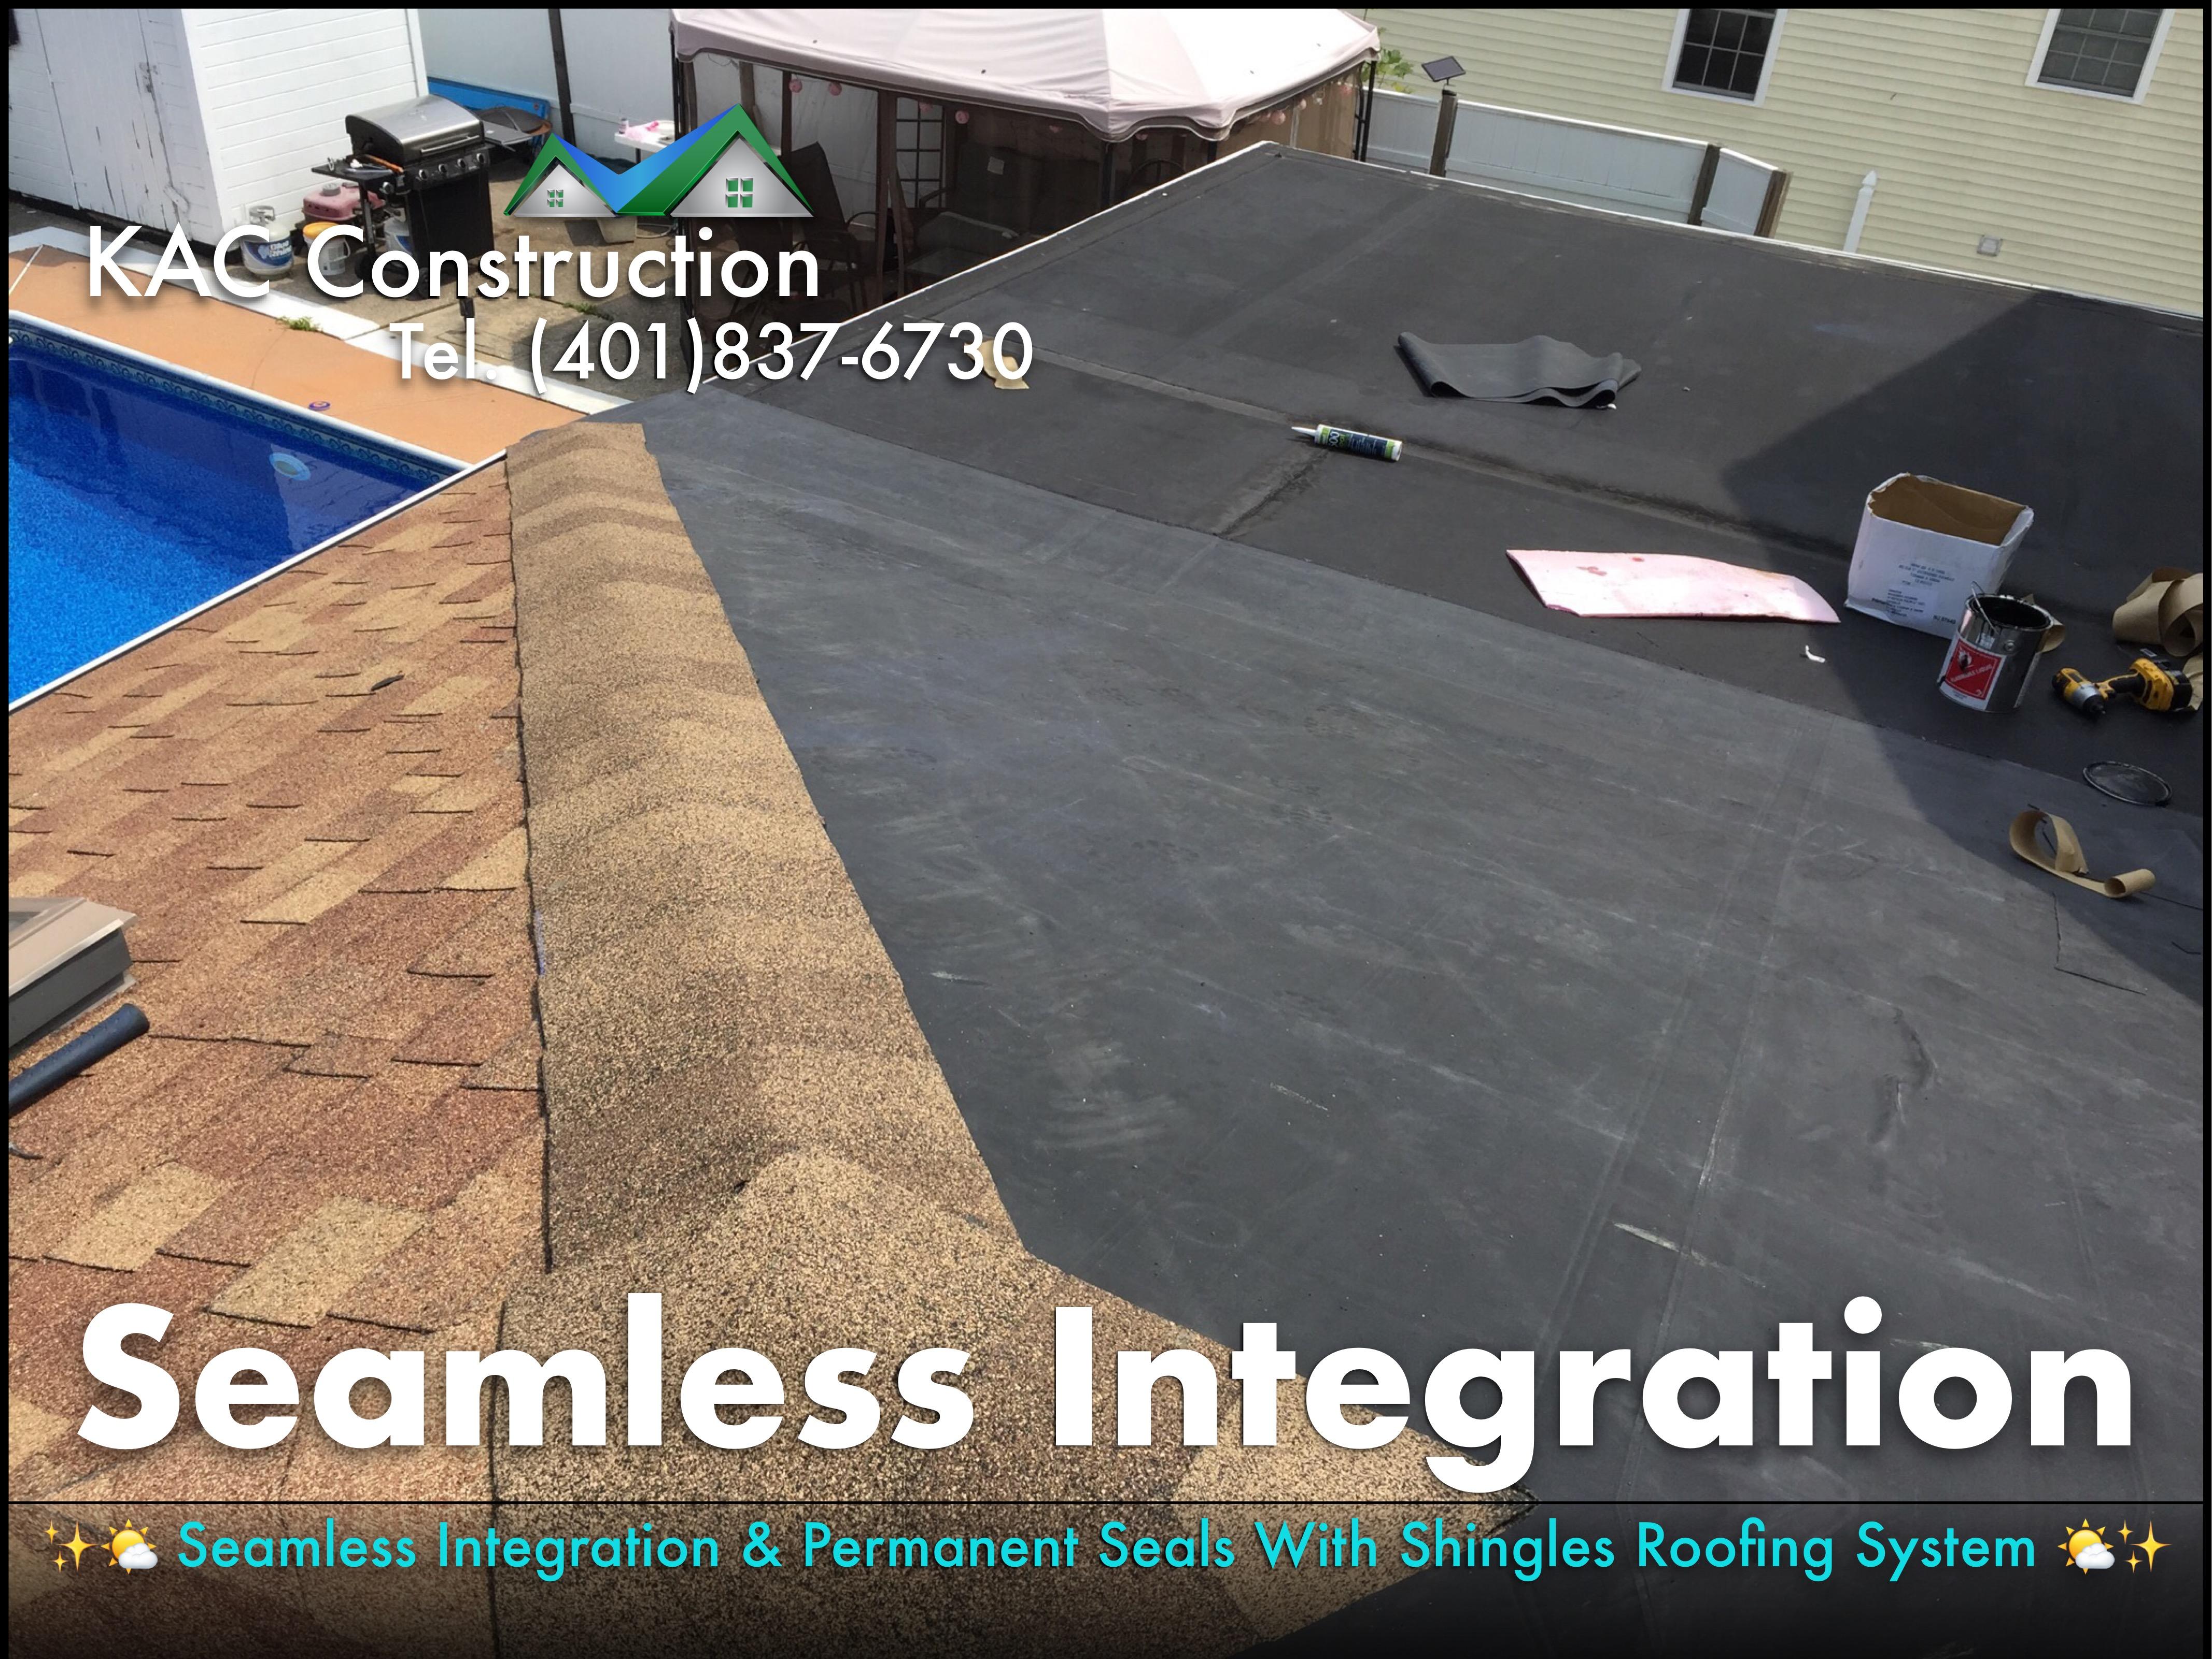 Rubber roof, rubber roof providence, rubber roof providence ri, rubber roof in providence, rubber roof in providence RI, rubber roof contractor providence, rubber roof contractor providence ri,